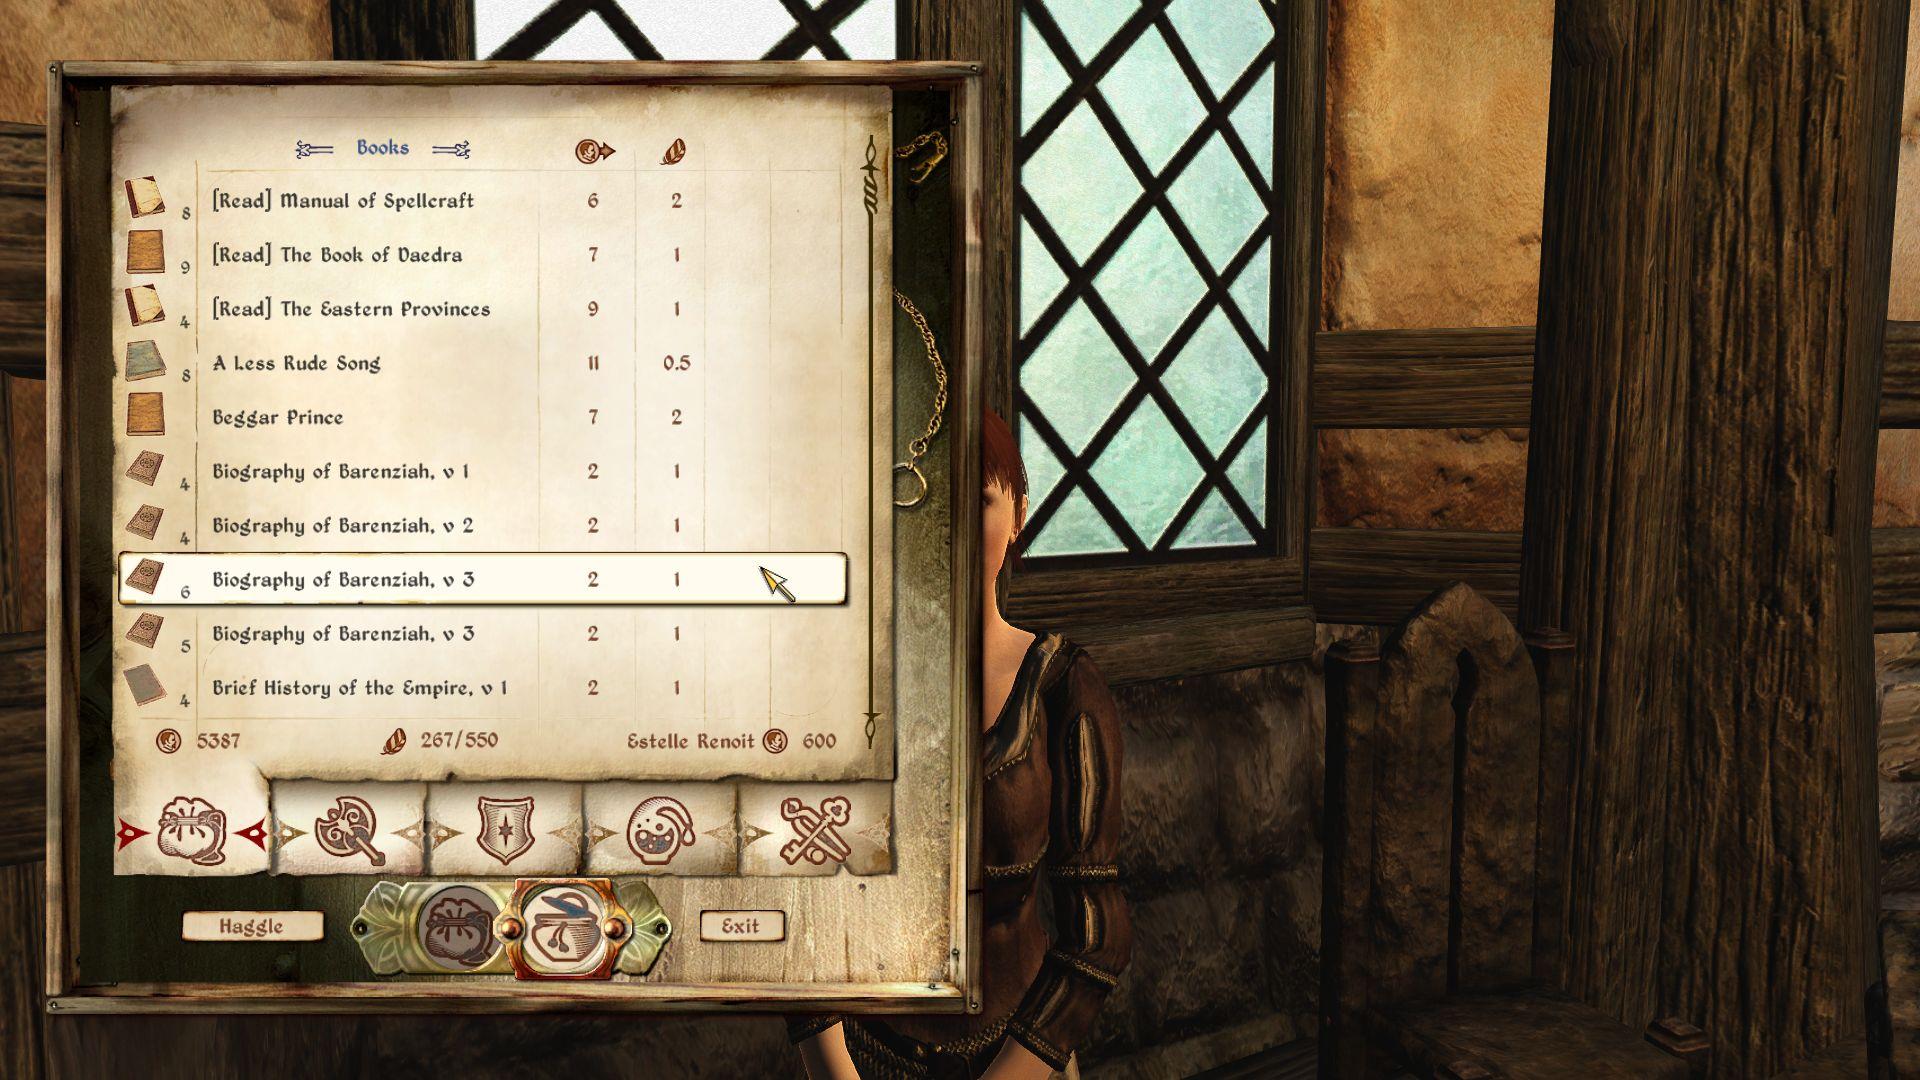 Show read books in merchant menu